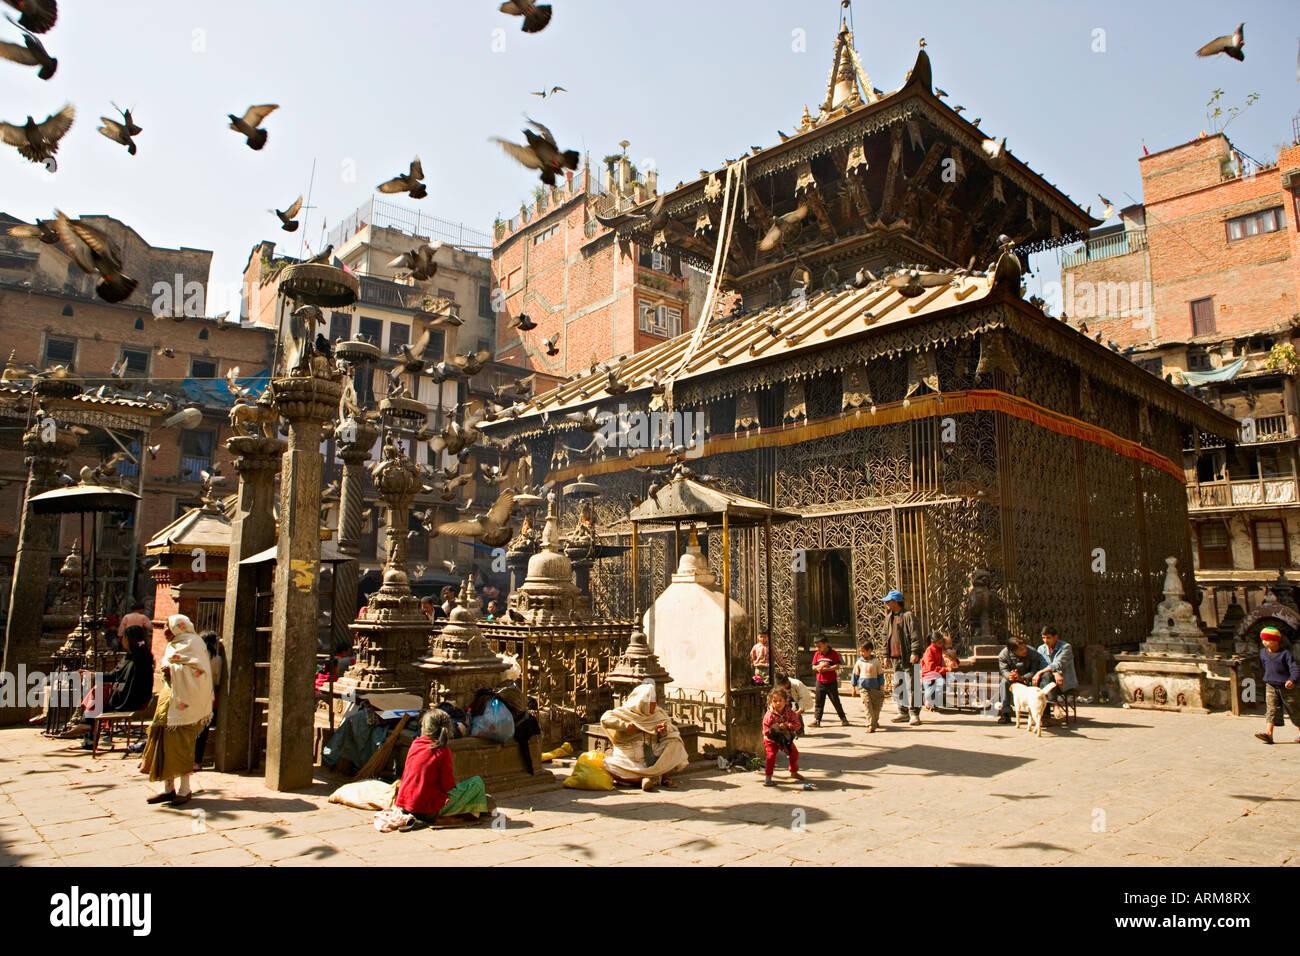 Seto Machendranath temple, close to Durbar Square, Kathmandu, Nepal - Stock Image